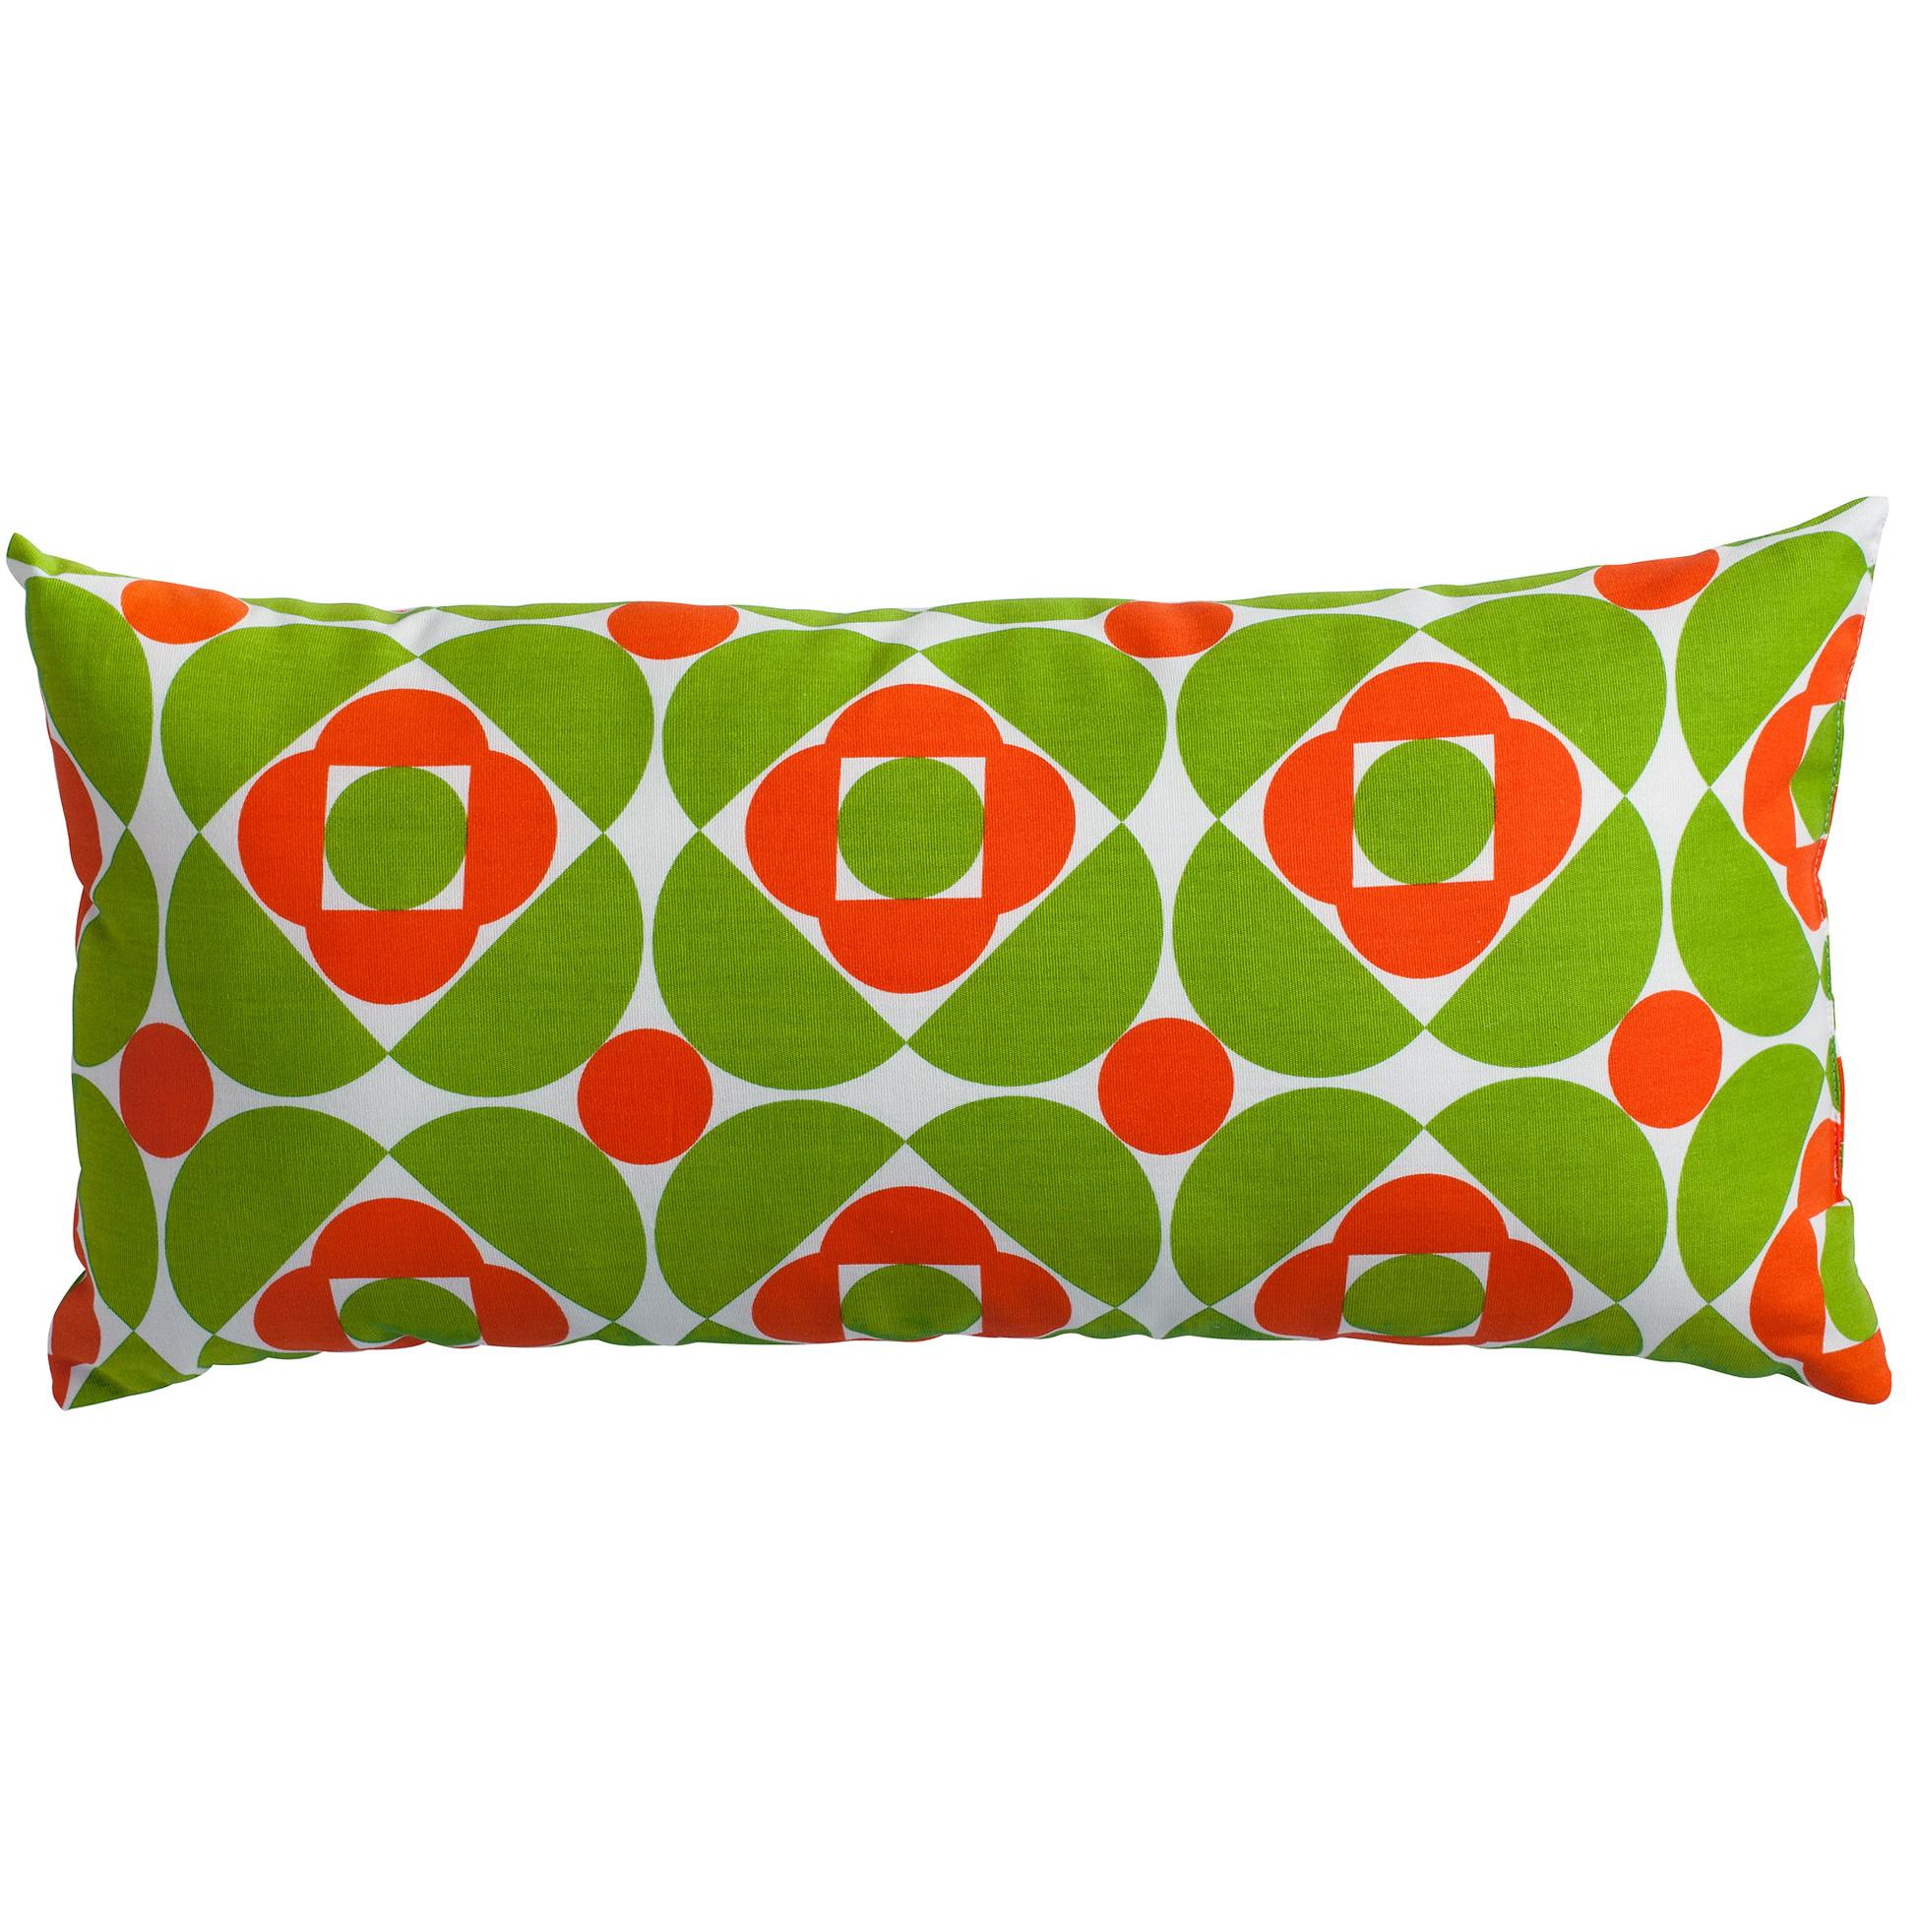 Cushion Covers Ikea Singapore